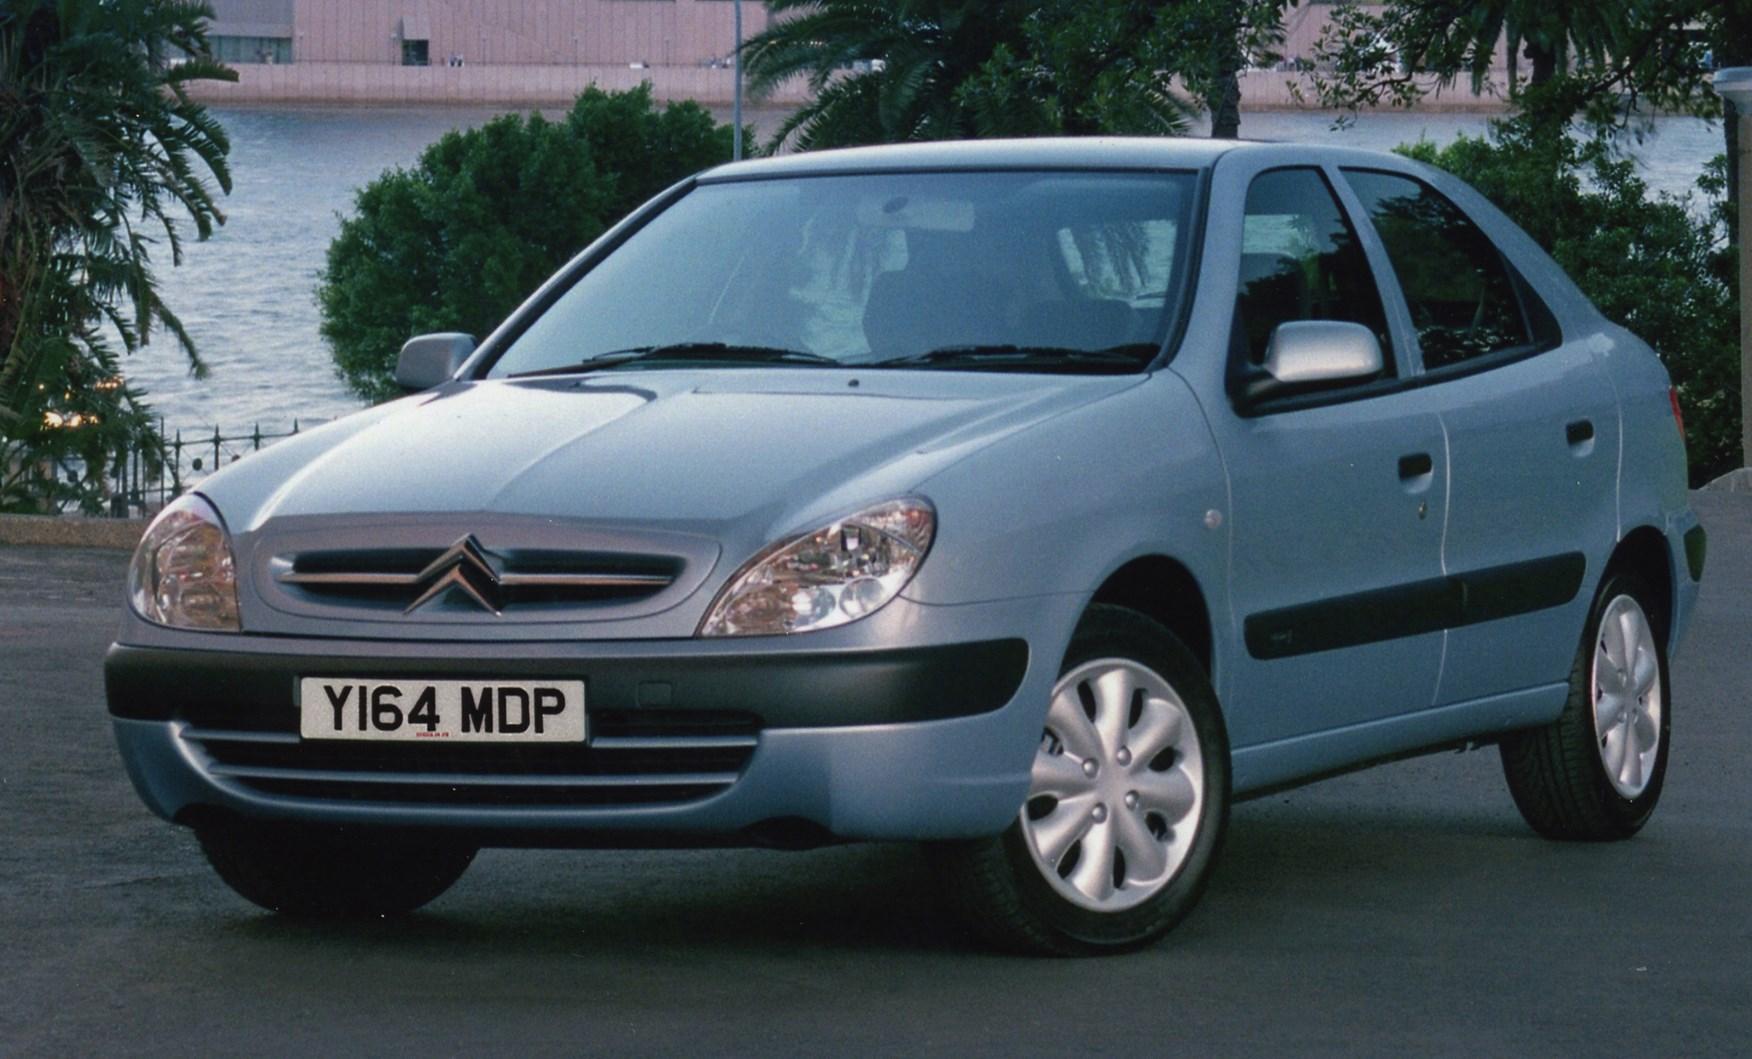 Citroen C4 Cactus Green >> Citroën Xsara Hatchback Review (2000 - 2004) | Parkers